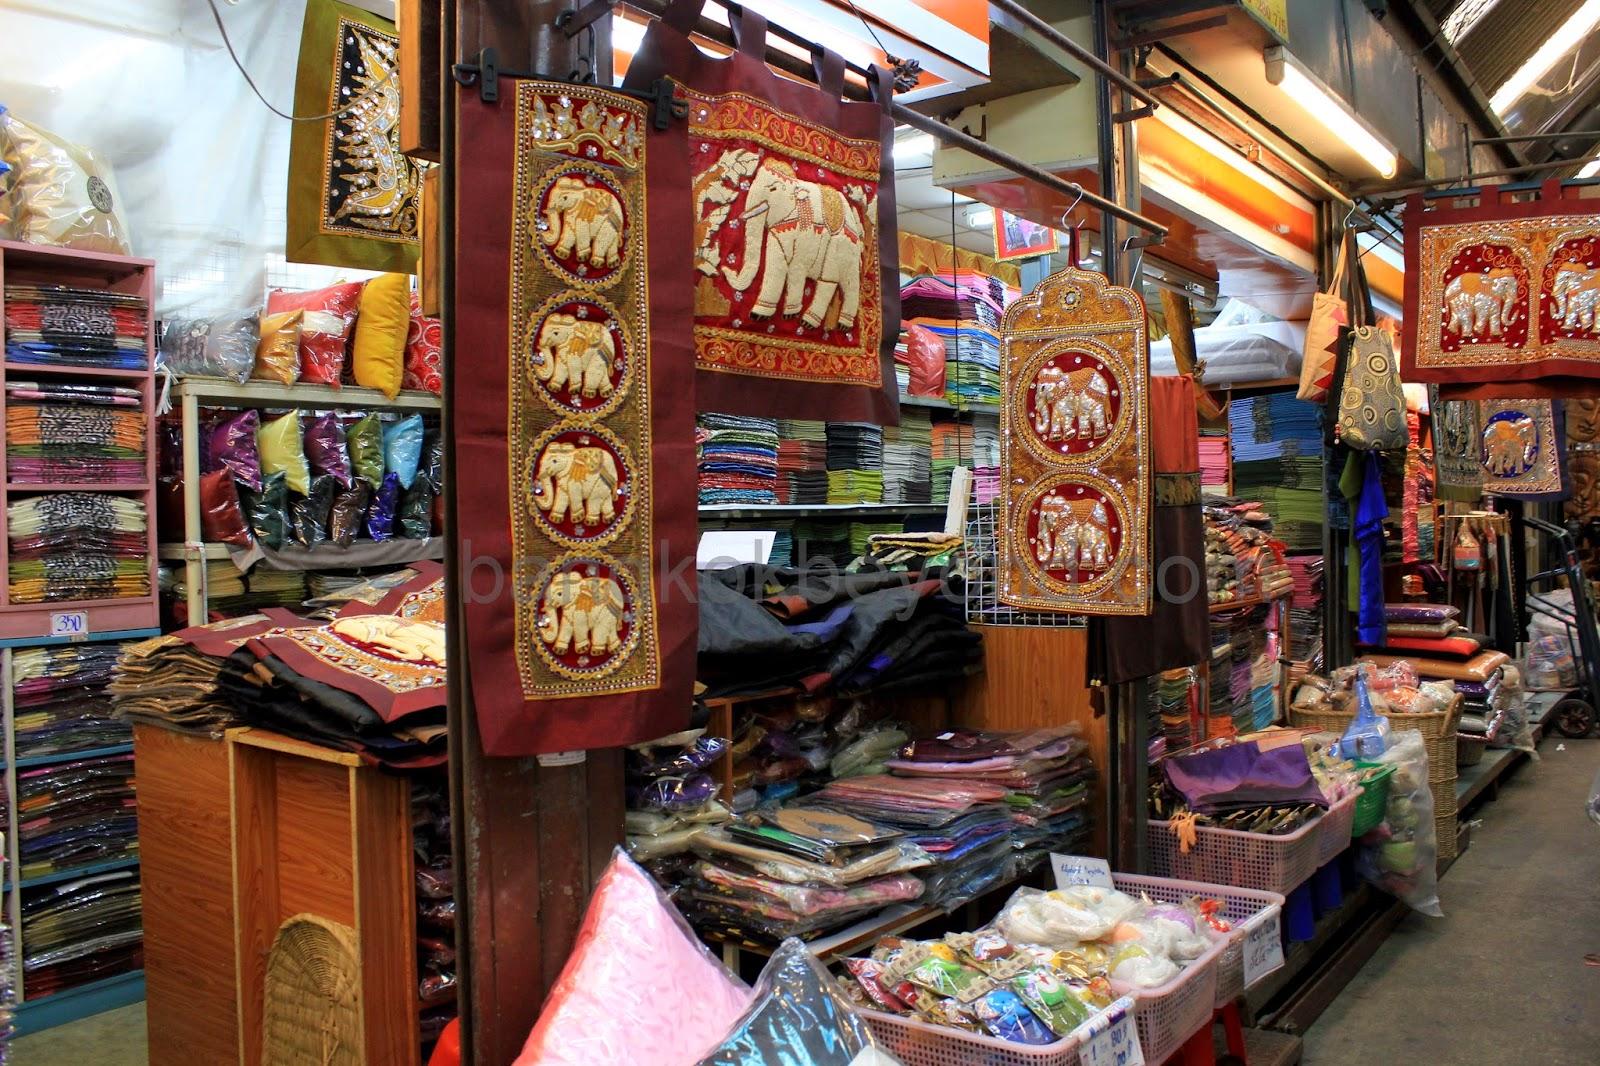 Lupa Beli Souvenir Saat Di Luar Negeri? Borong Aja Di Pasar Tanah Abang